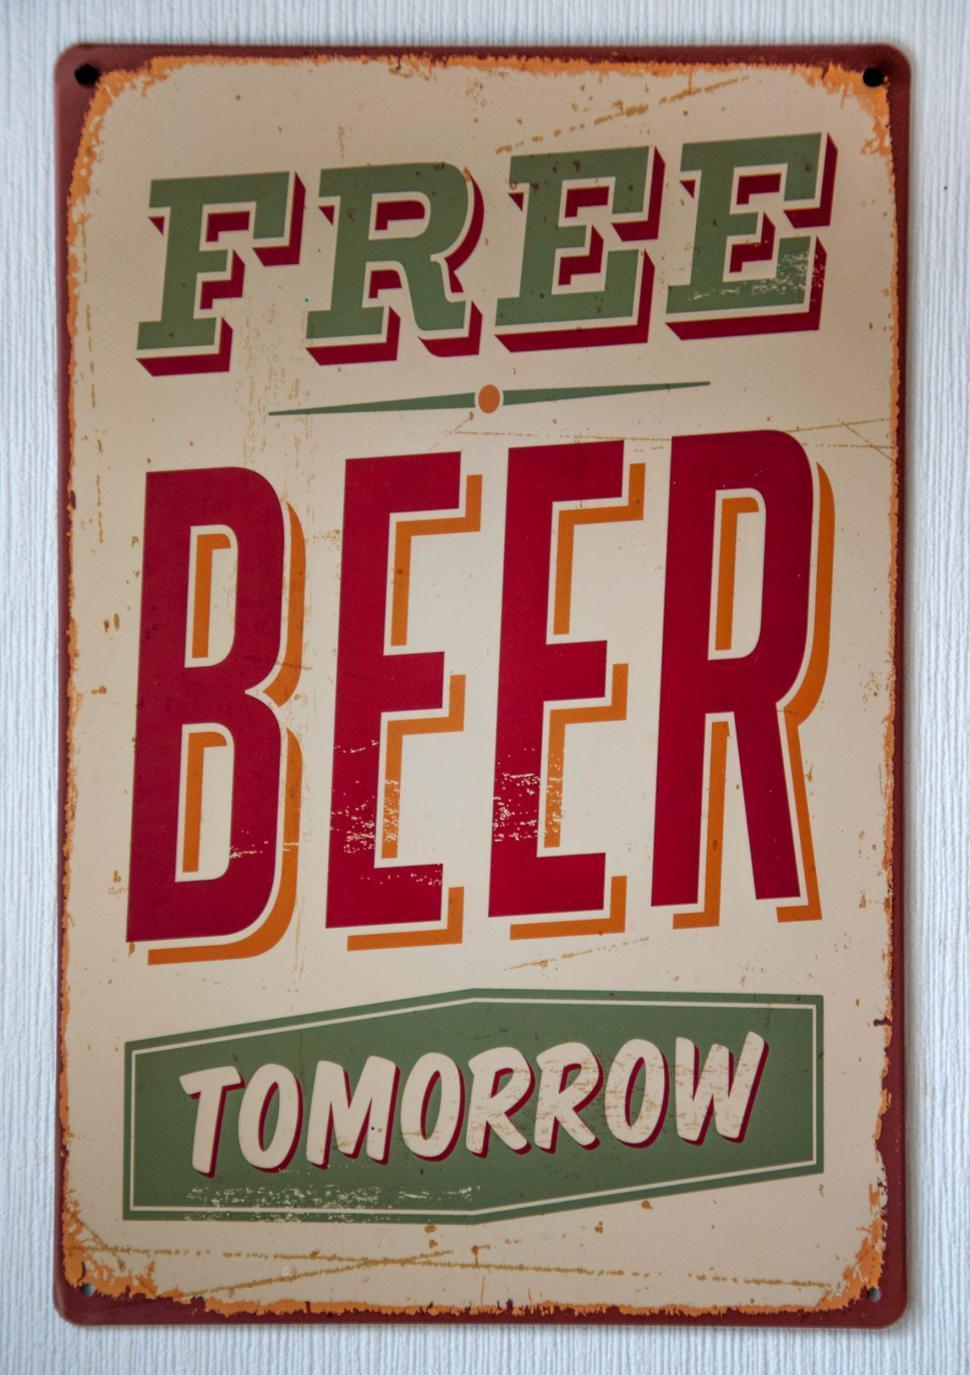 Download Free Stock Photo of Vintage Free Beer Tomorrow Metal Sign